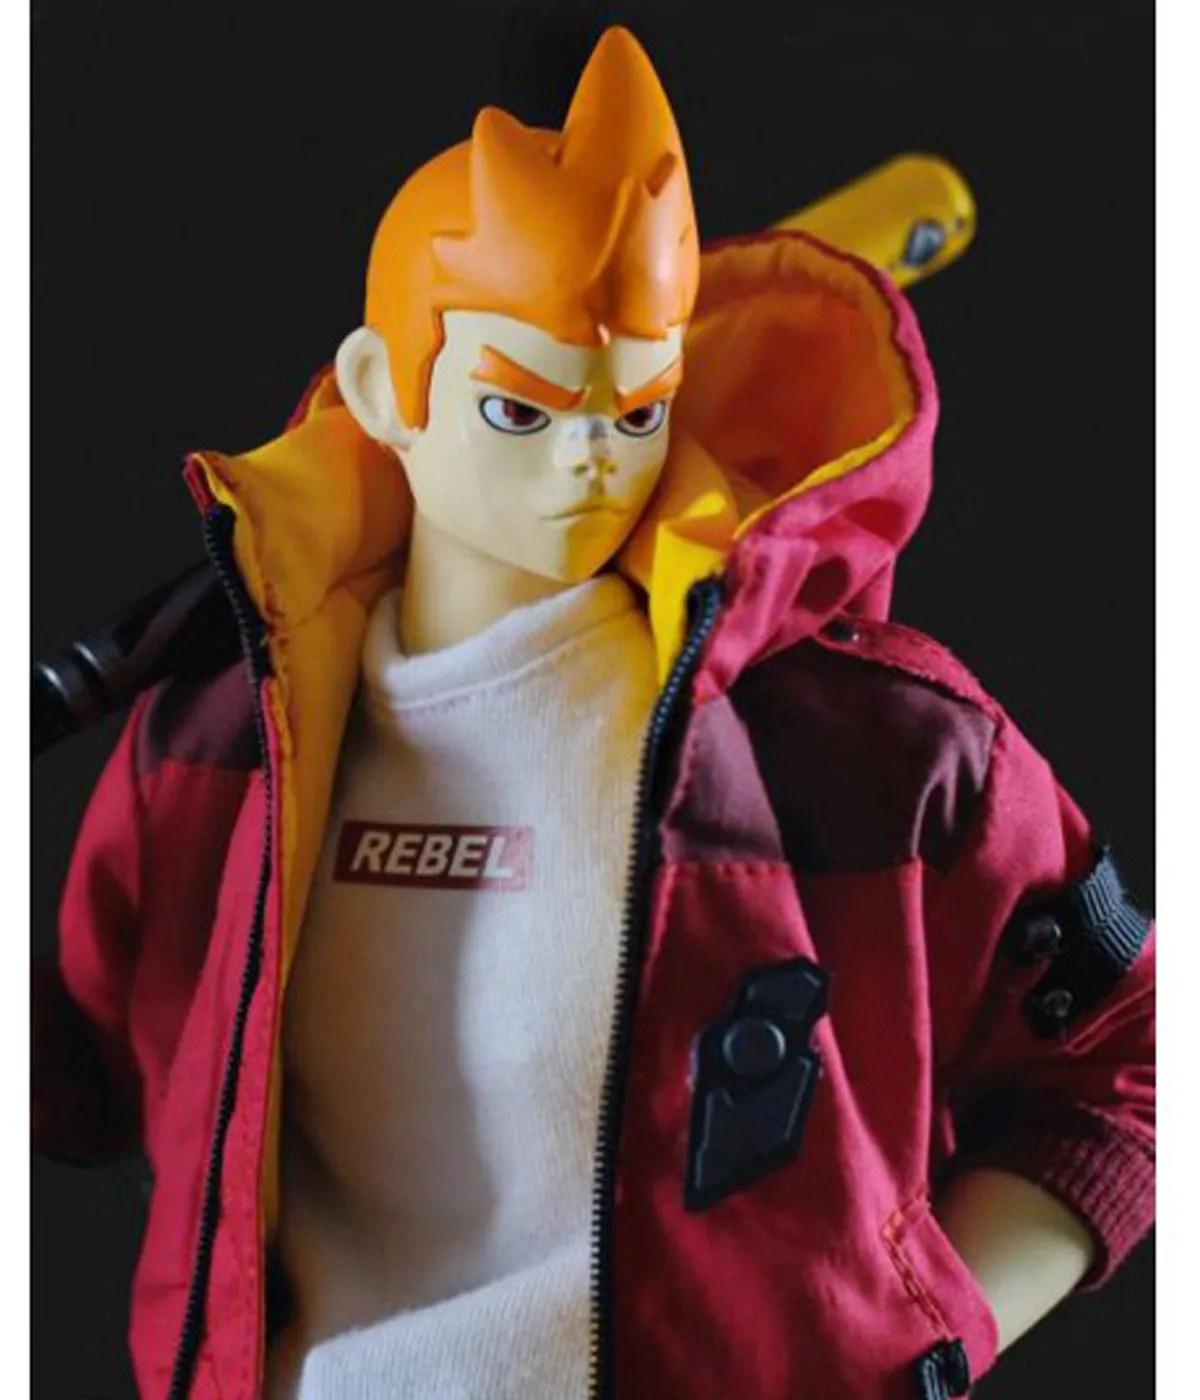 goku-no-fear-no-mercy-dragon-ball-cotton-jacket